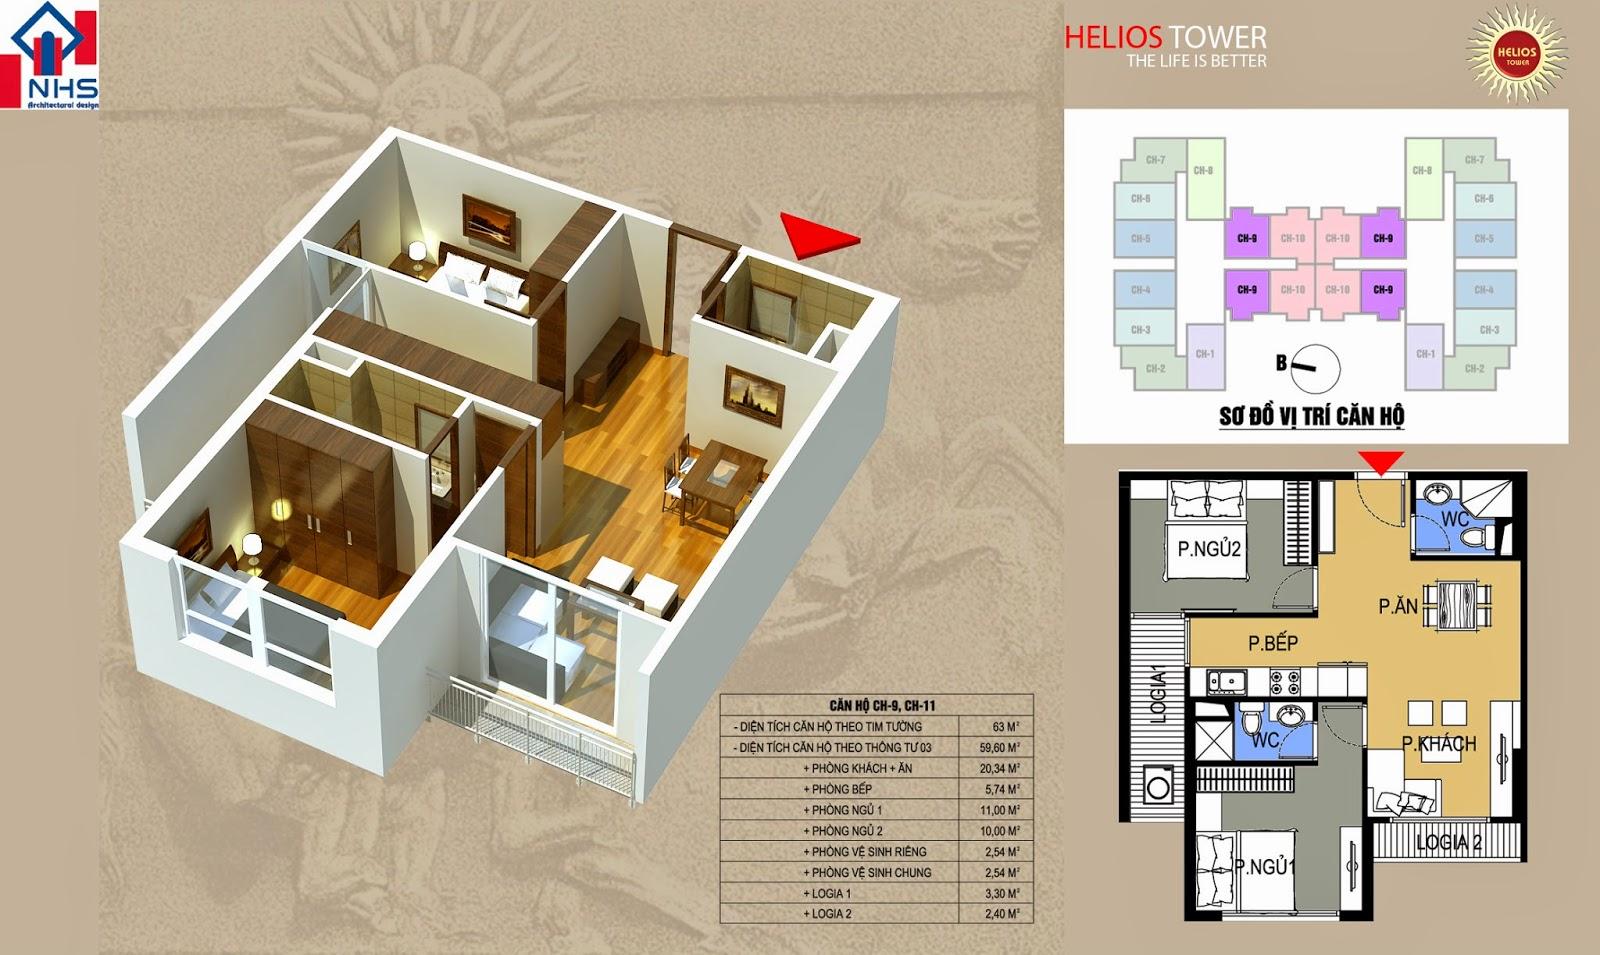 Căn 09 11 Helios Tower 75 Tam Trinh